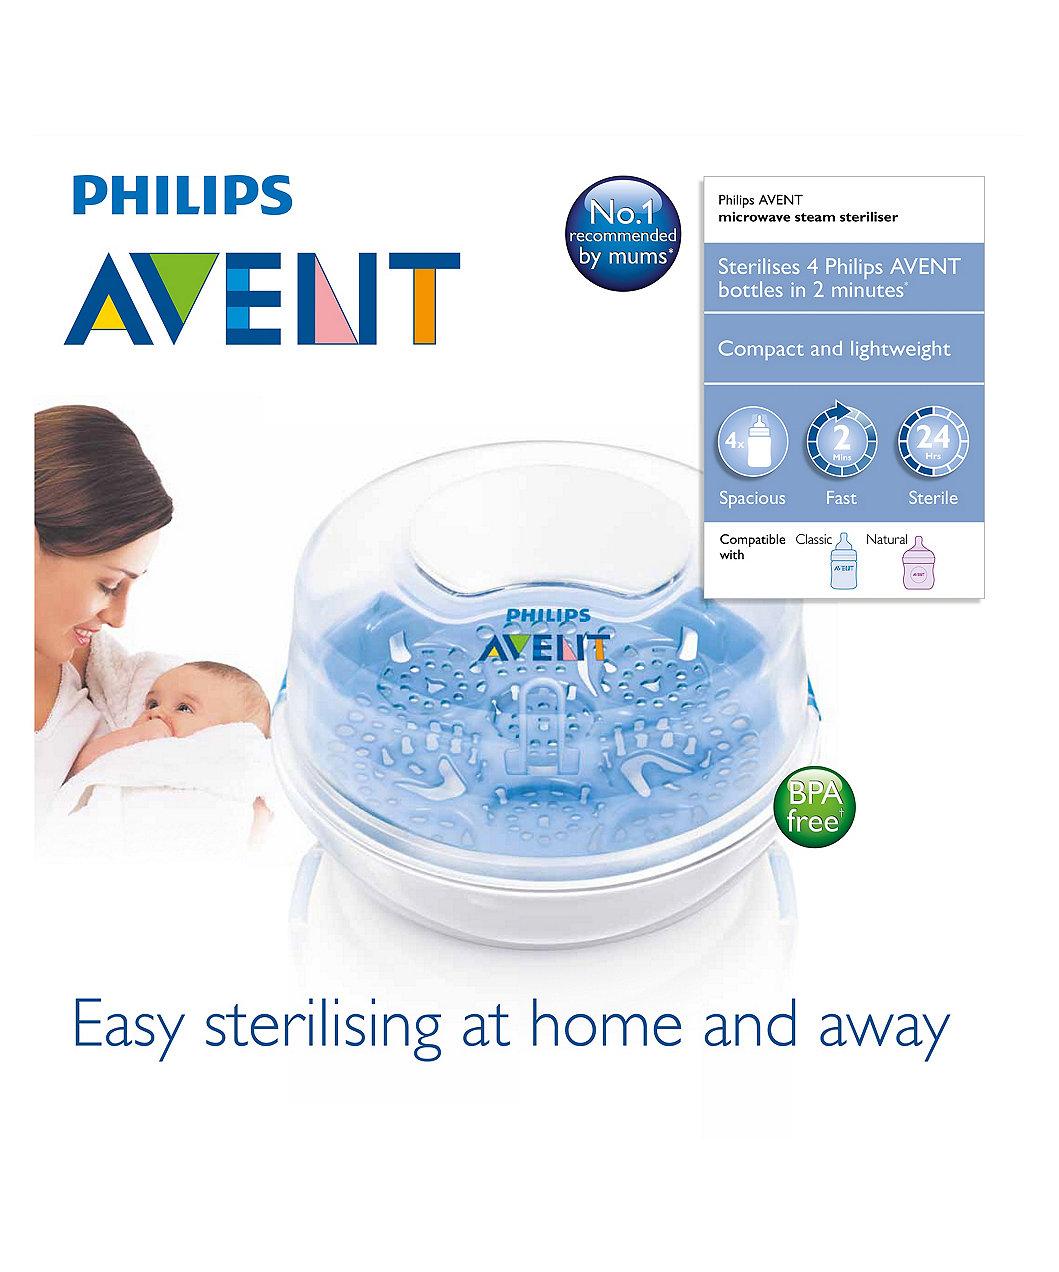 philips avent microwave steam steriliser instructions